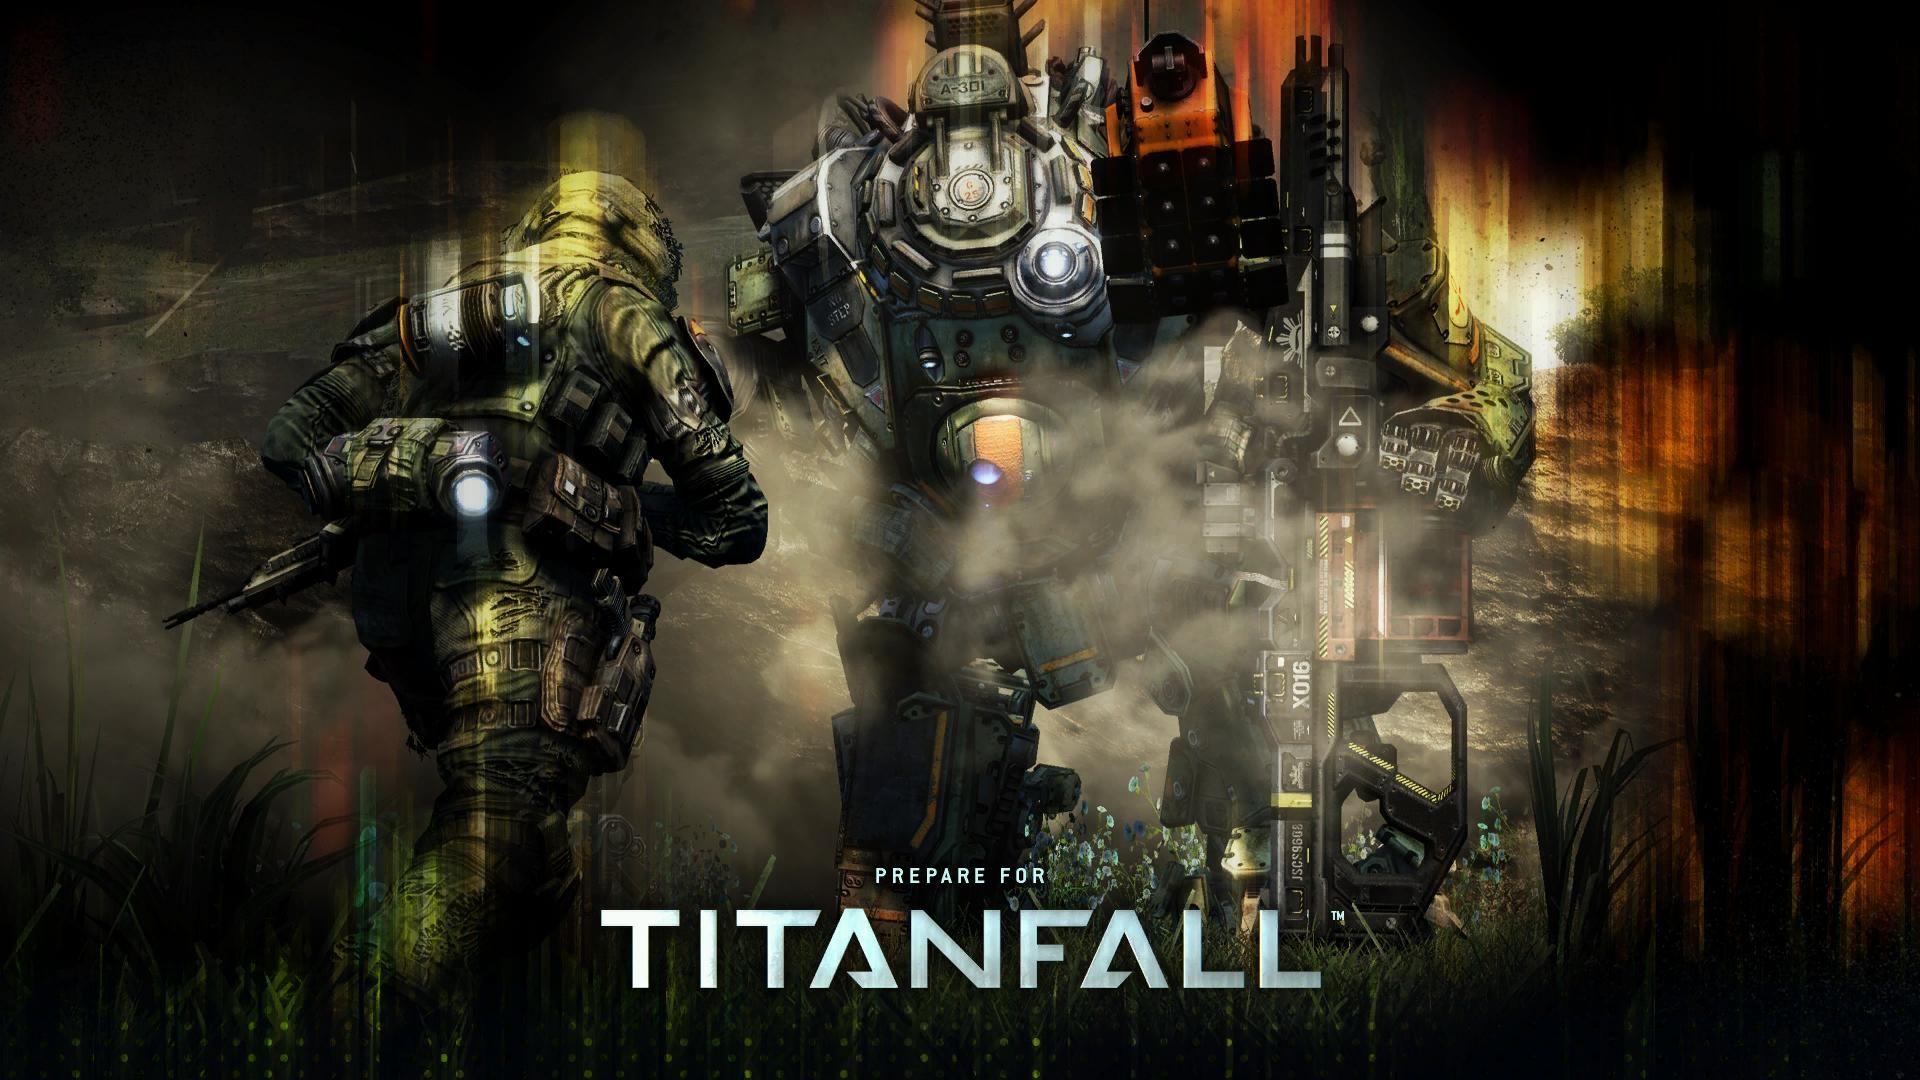 Titanfall Game 3d Wallpaper Twitch Mlg Online Streaming Gaming Titanfall Titanfall Game World Of Warcraft Gold